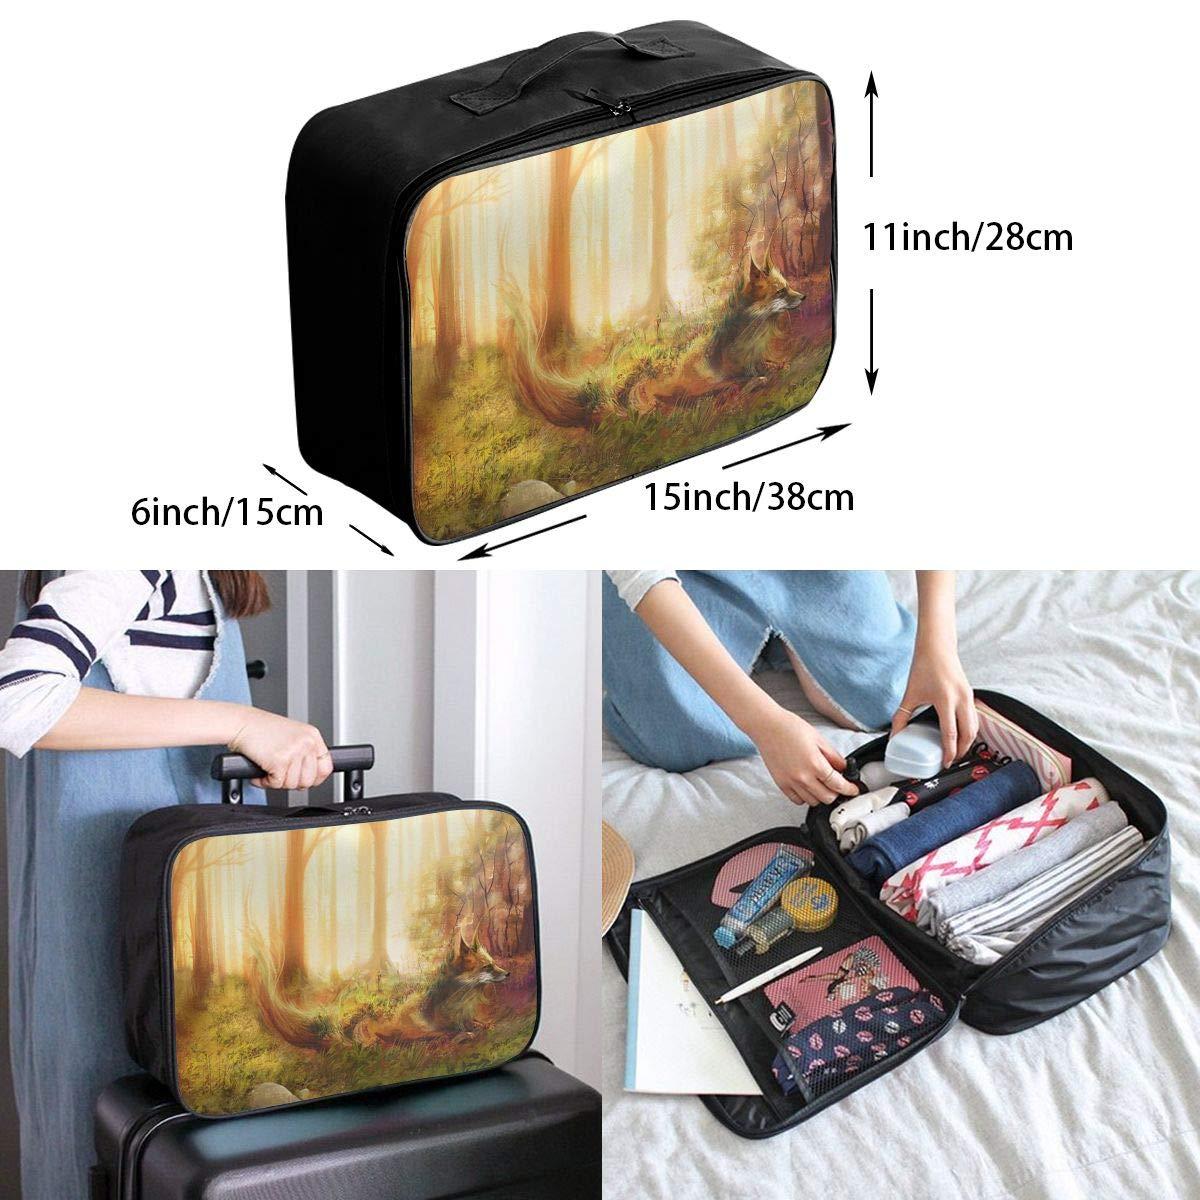 Travel Luggage Duffle Bag Lightweight Portable Handbag Fox Forest Large Capacity Waterproof Foldable Storage Tote